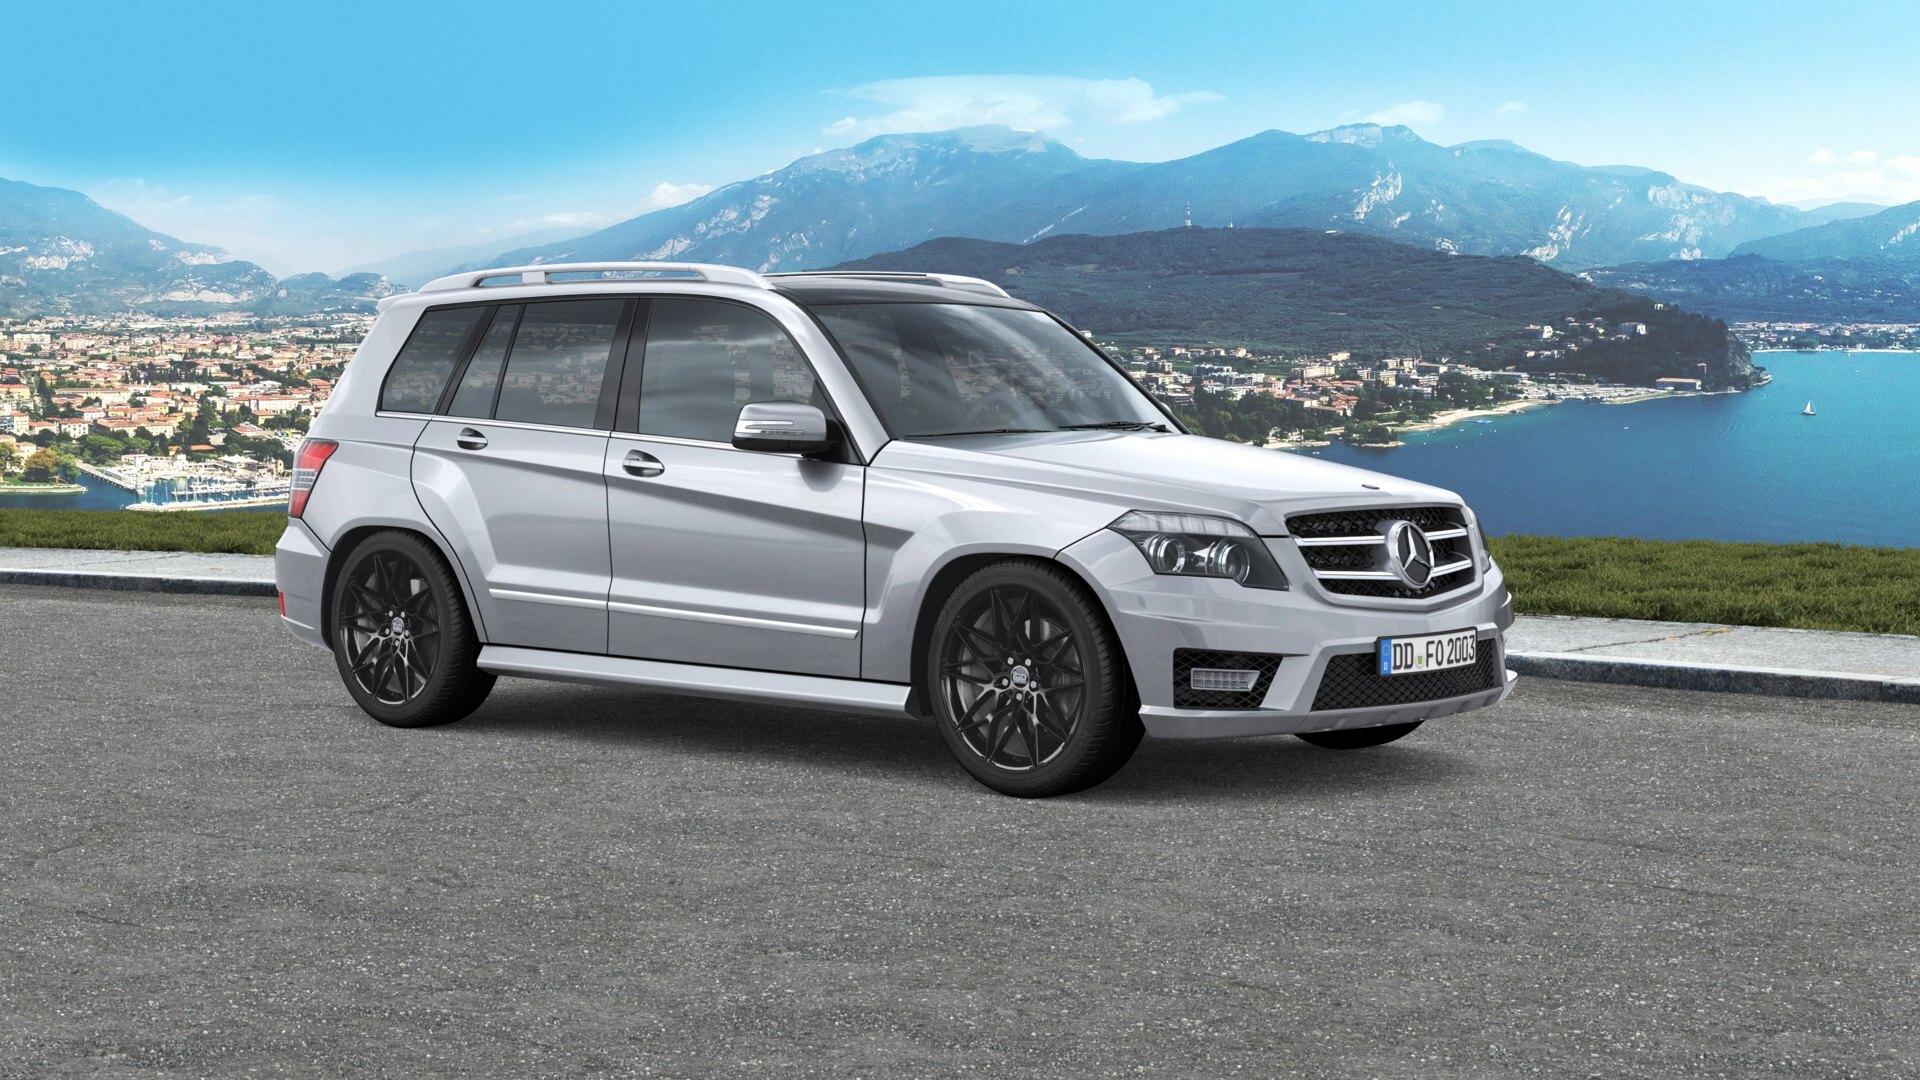 Mam B2 Black Painted For Your Mercedes Benz Glk Class Felgenoutlet Com